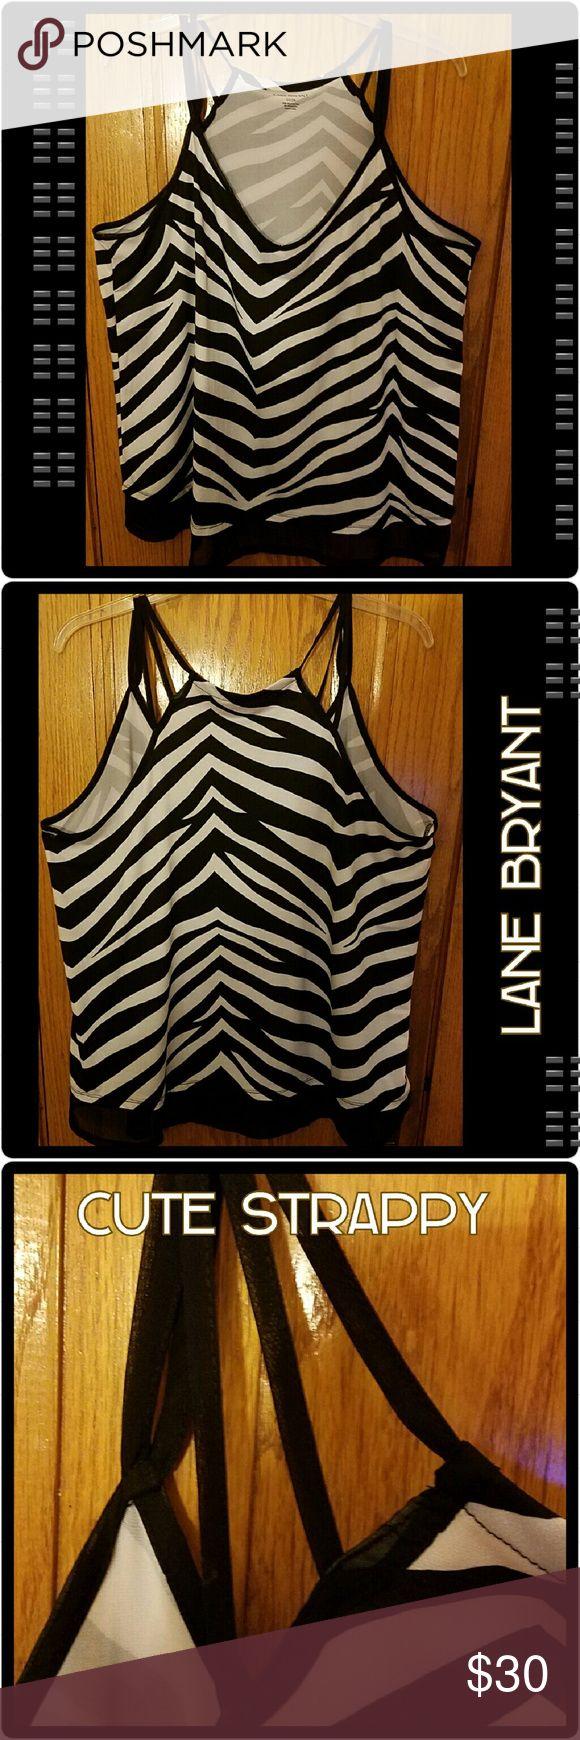 T-shirt design zeixs - New Mountain Design Silky Tank Top This Very Pretty Silky